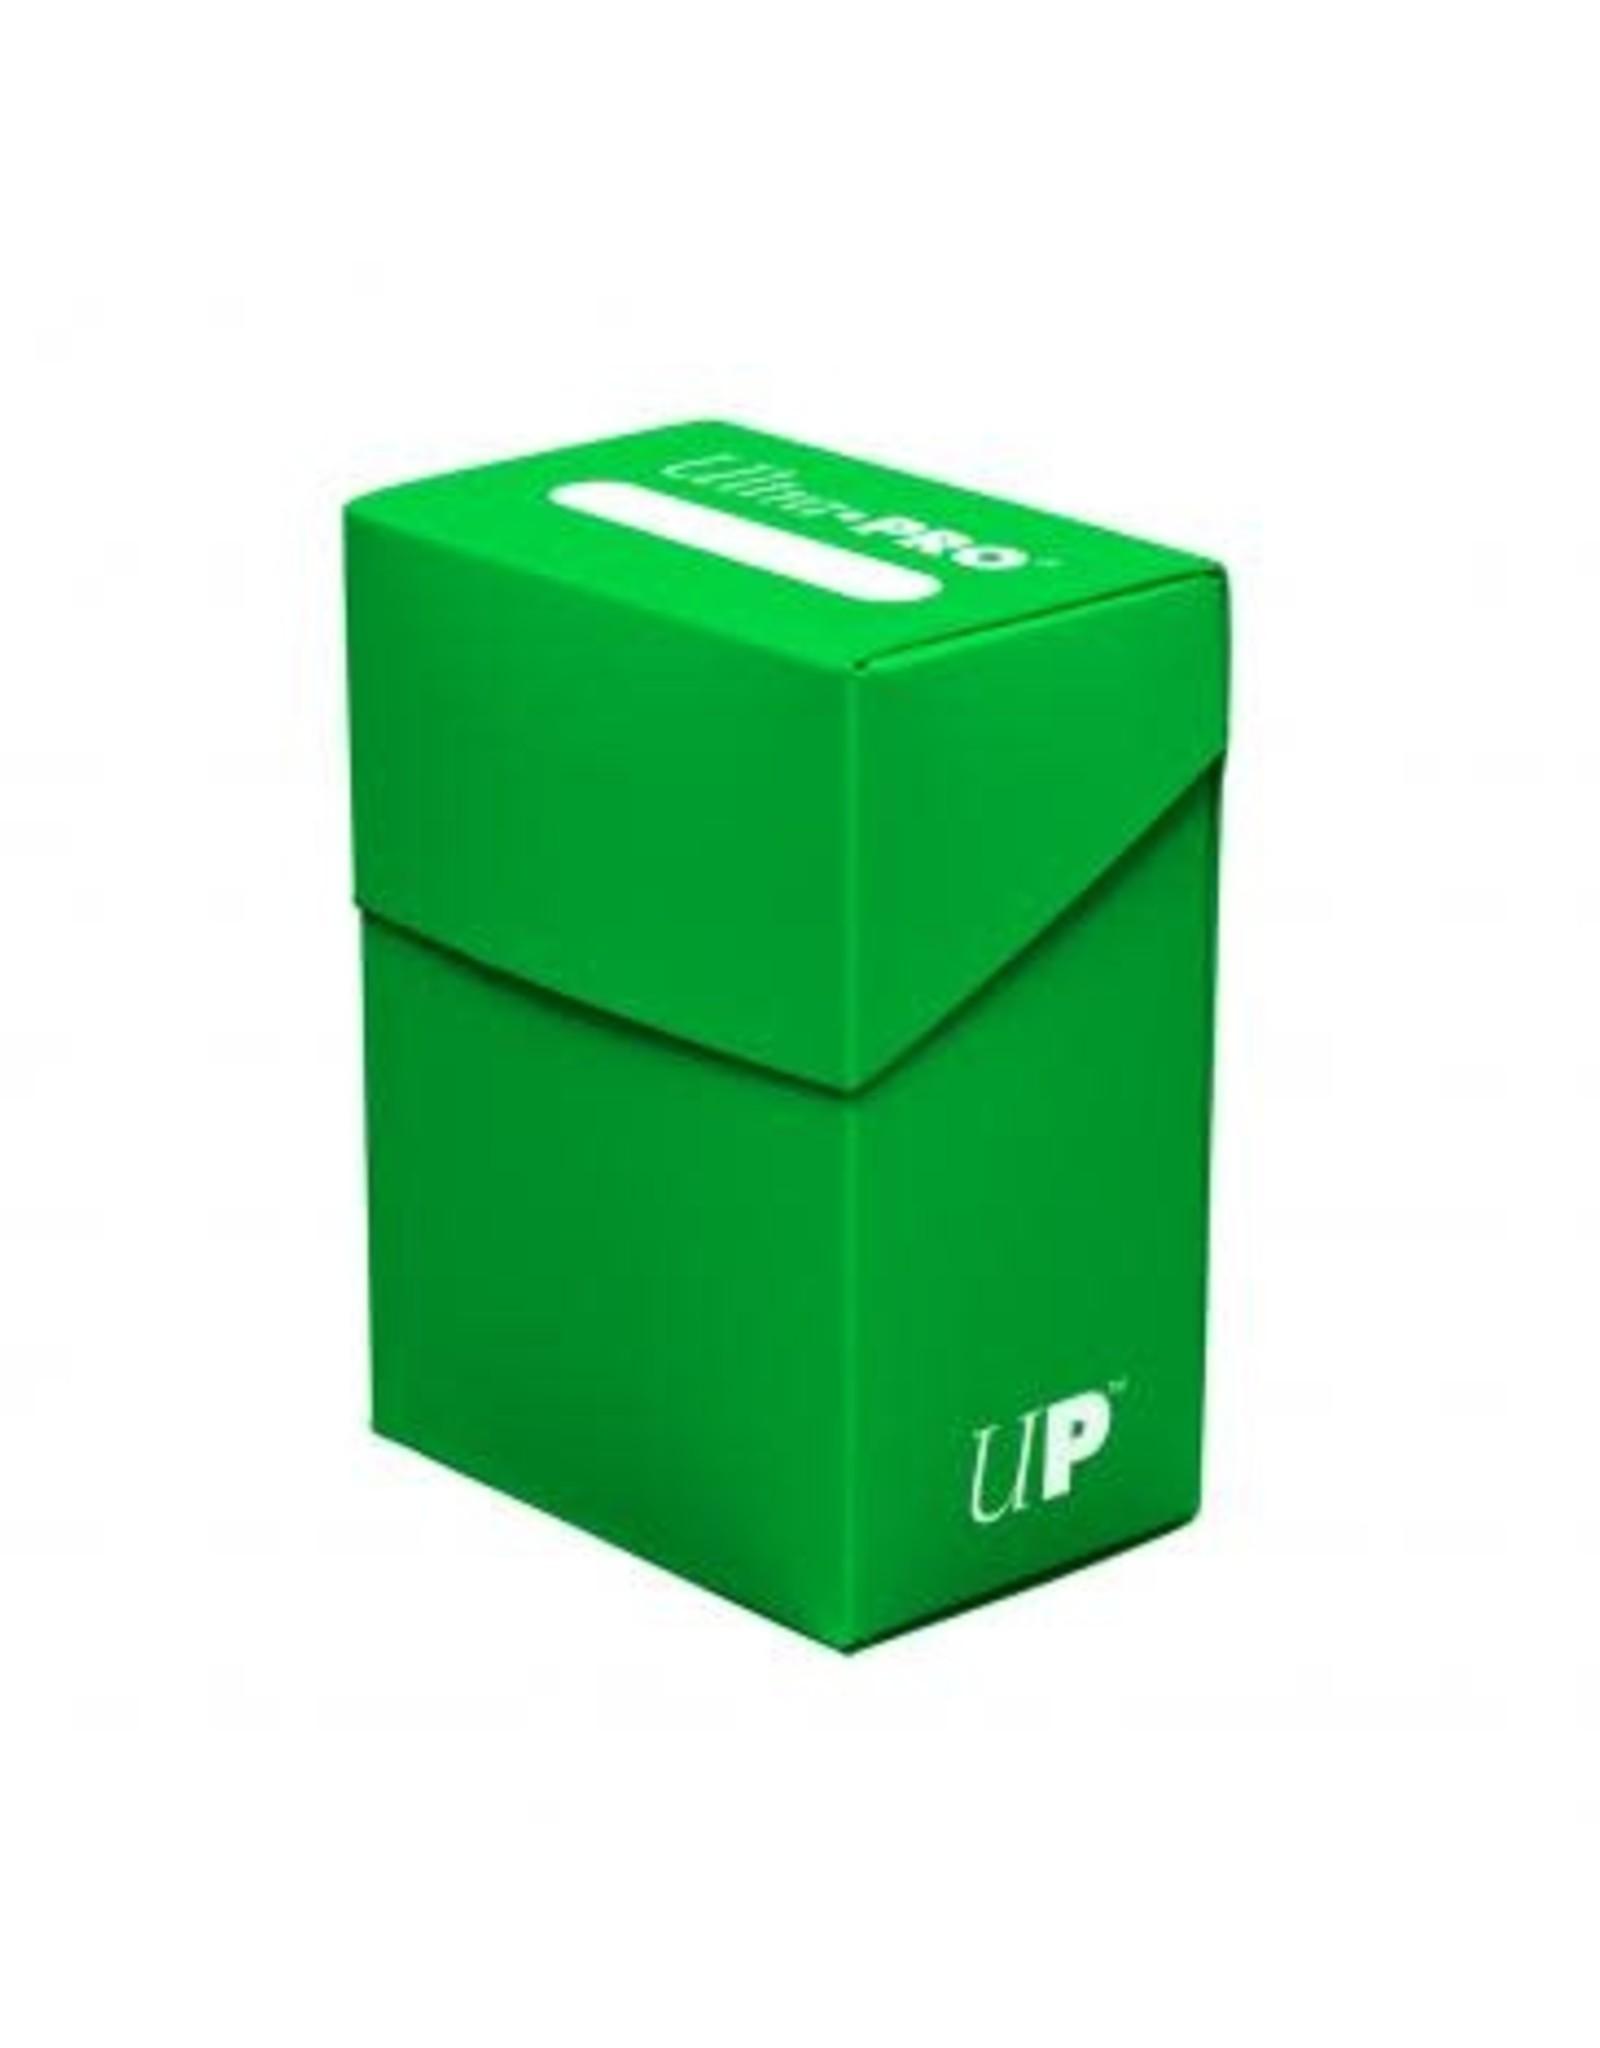 Ultra Pro Ultra Pro: Lime Green Deck Box